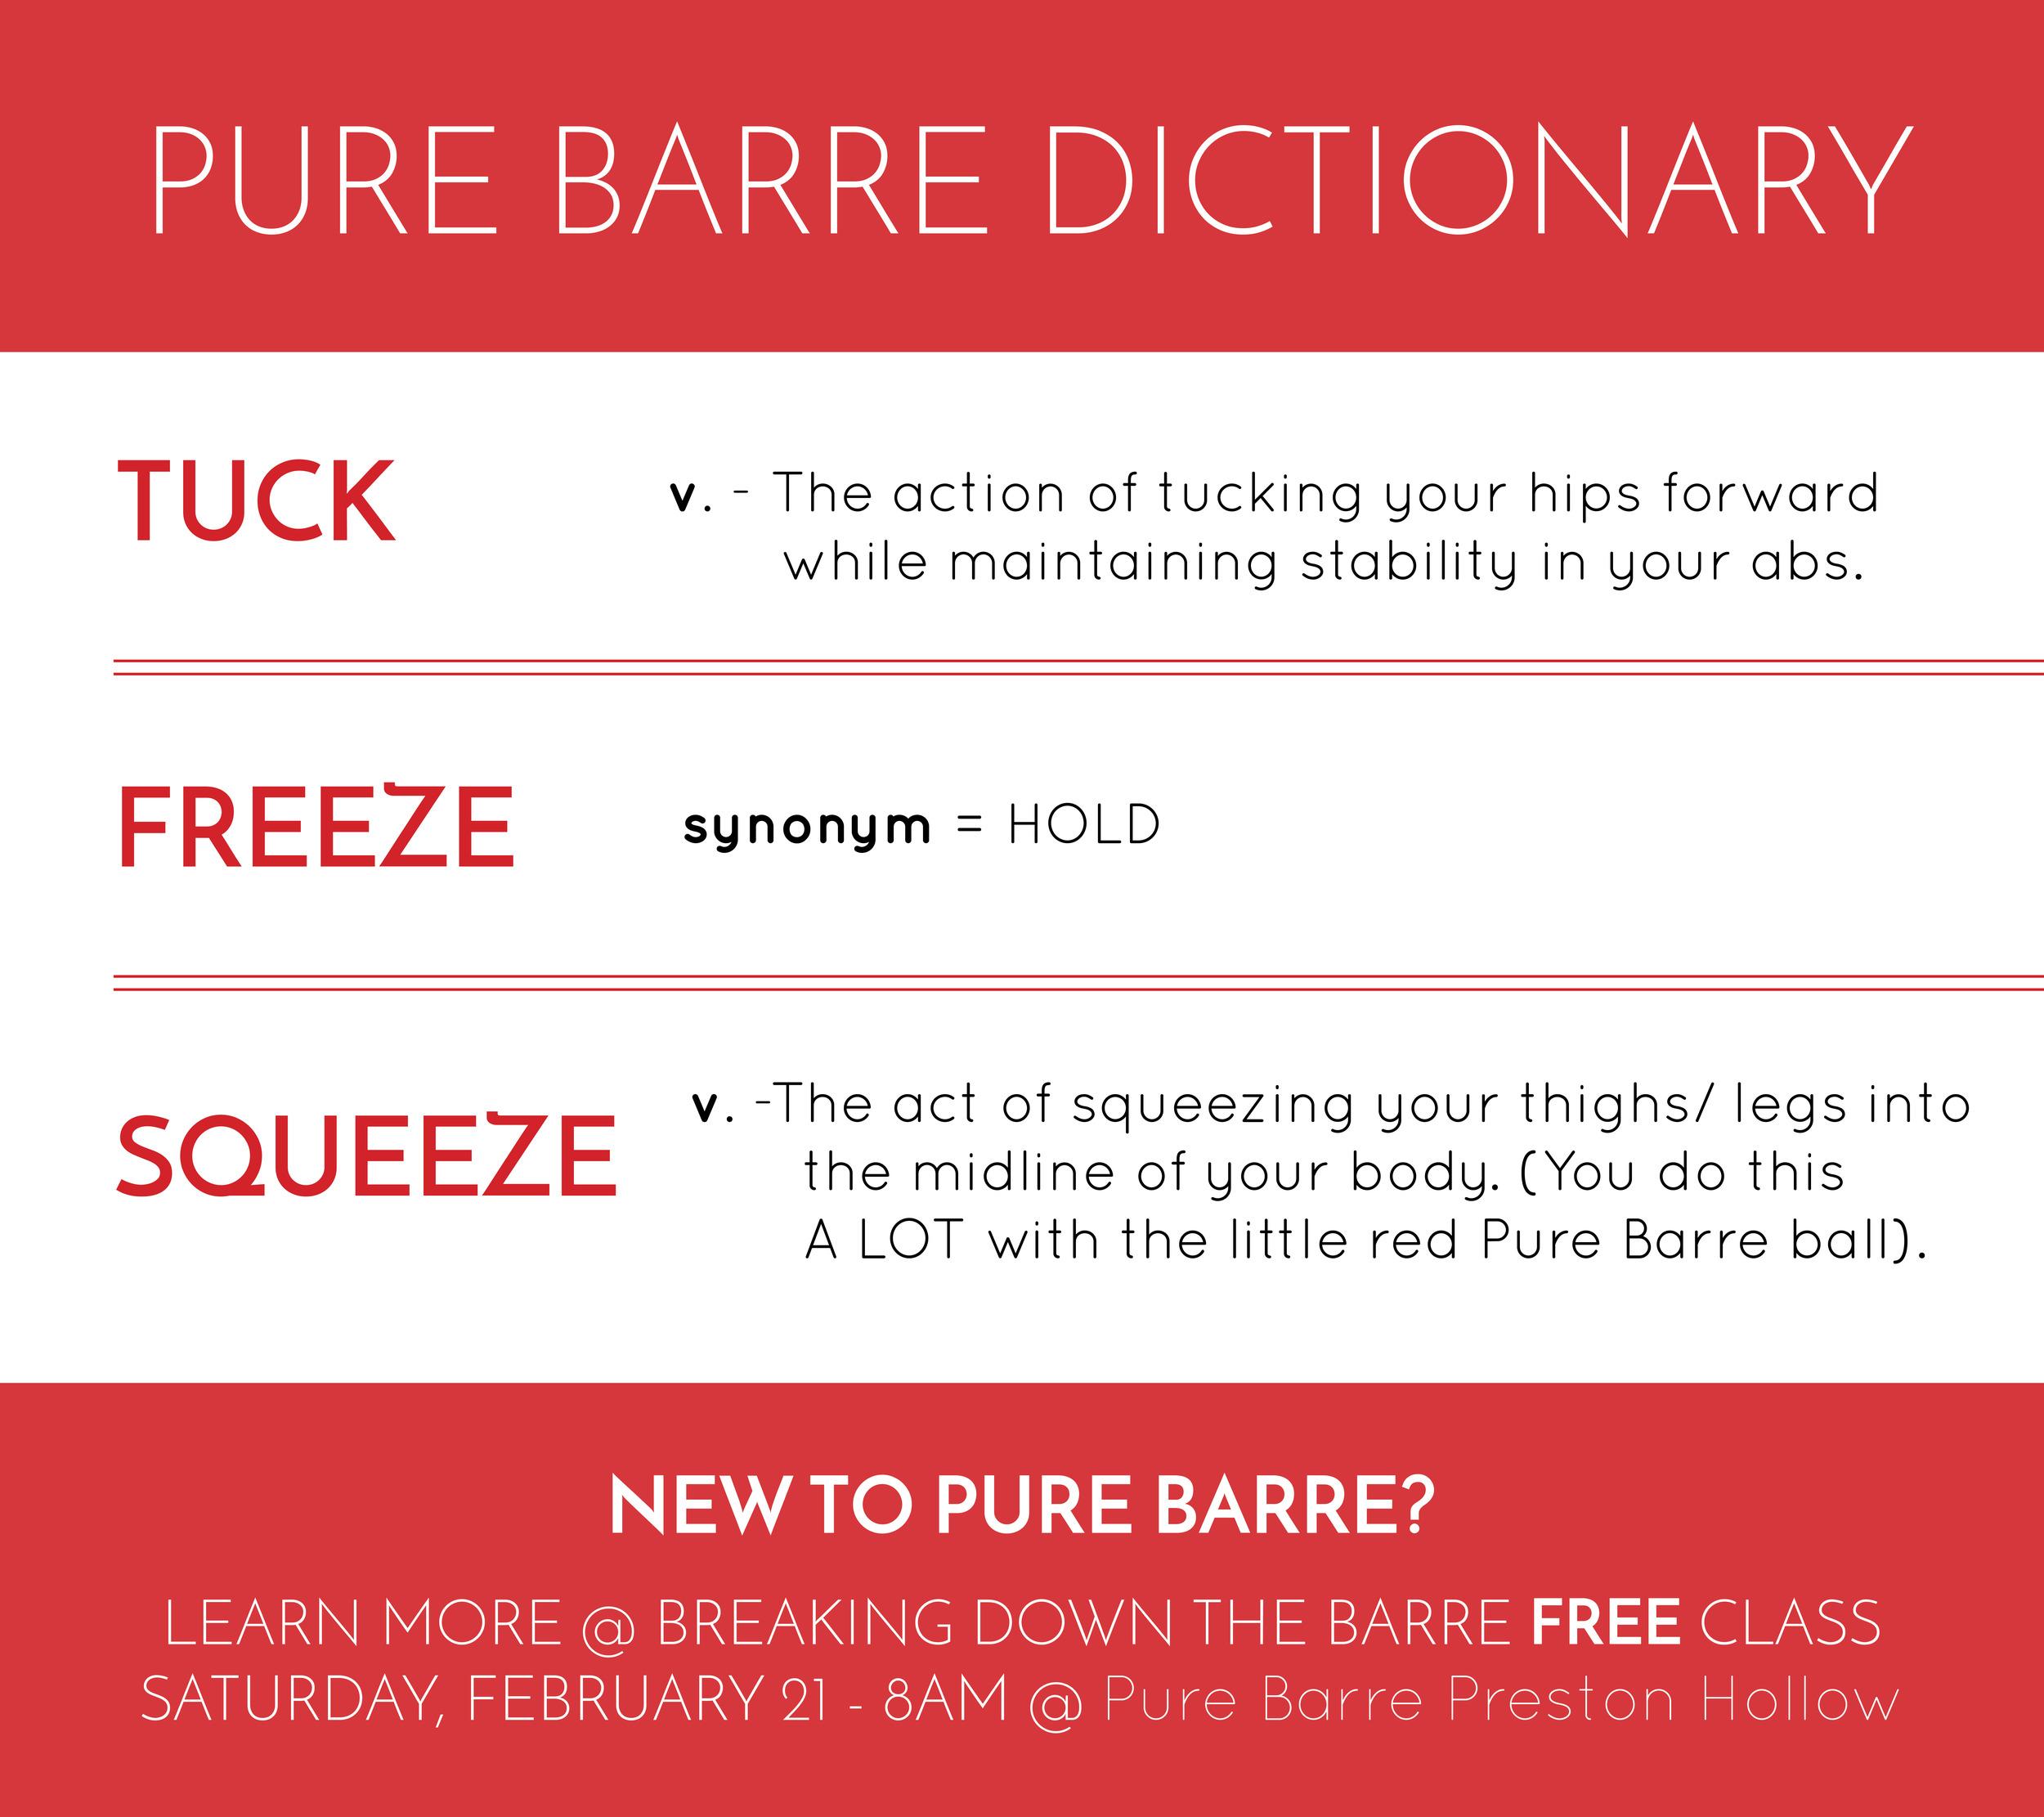 PureBarre_Dictionary_BreakingDownTheBarre